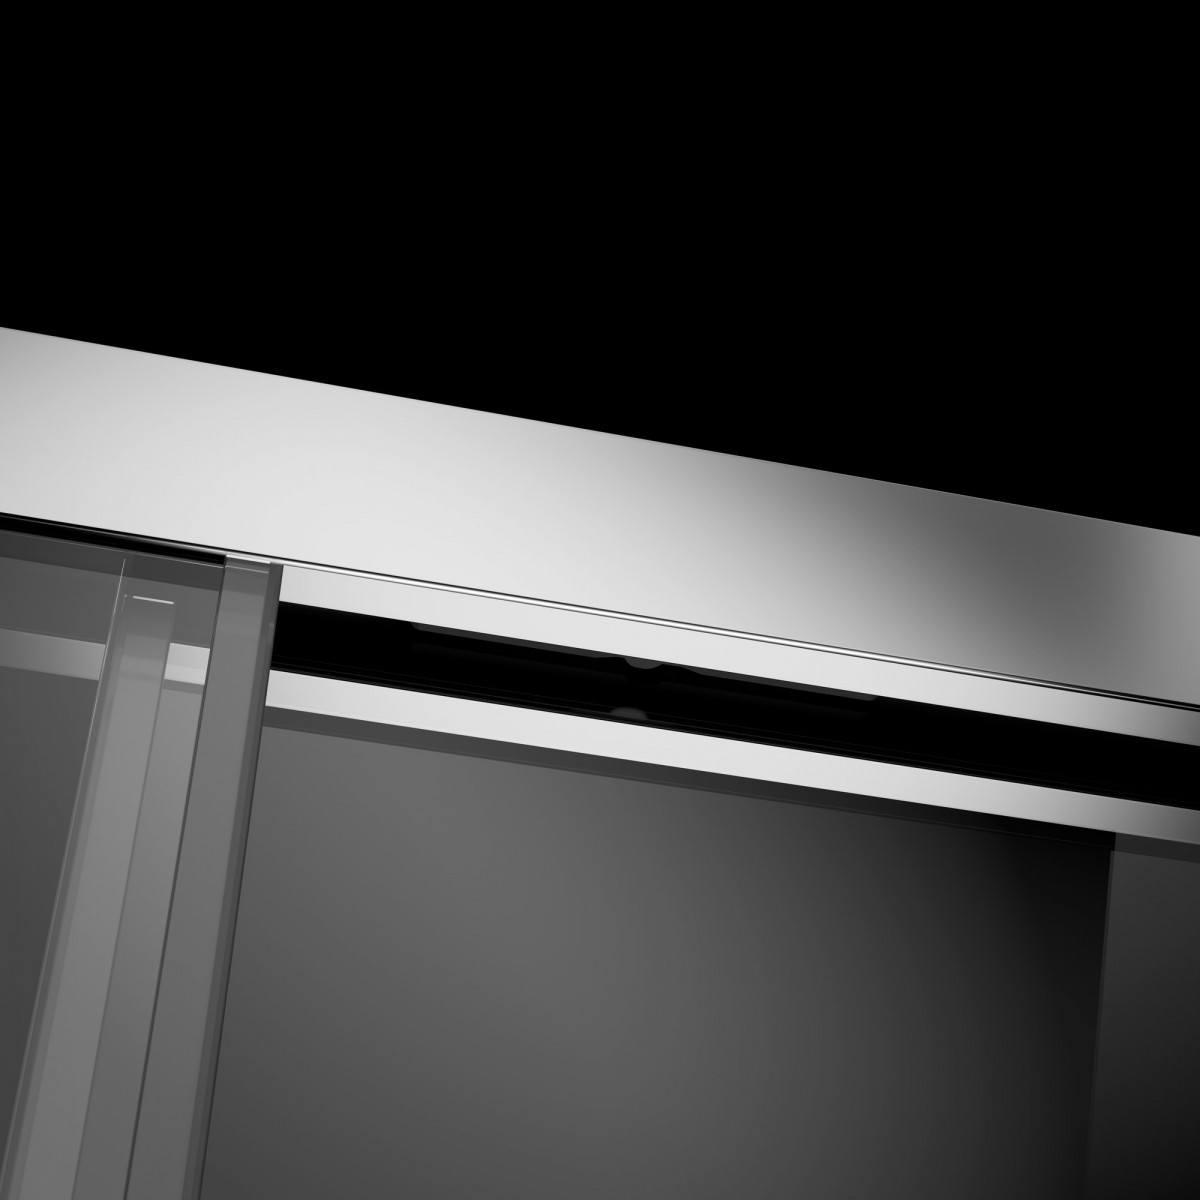 Душевой уголок Radaway Idea KDJ 100x80 прозрачное/хром